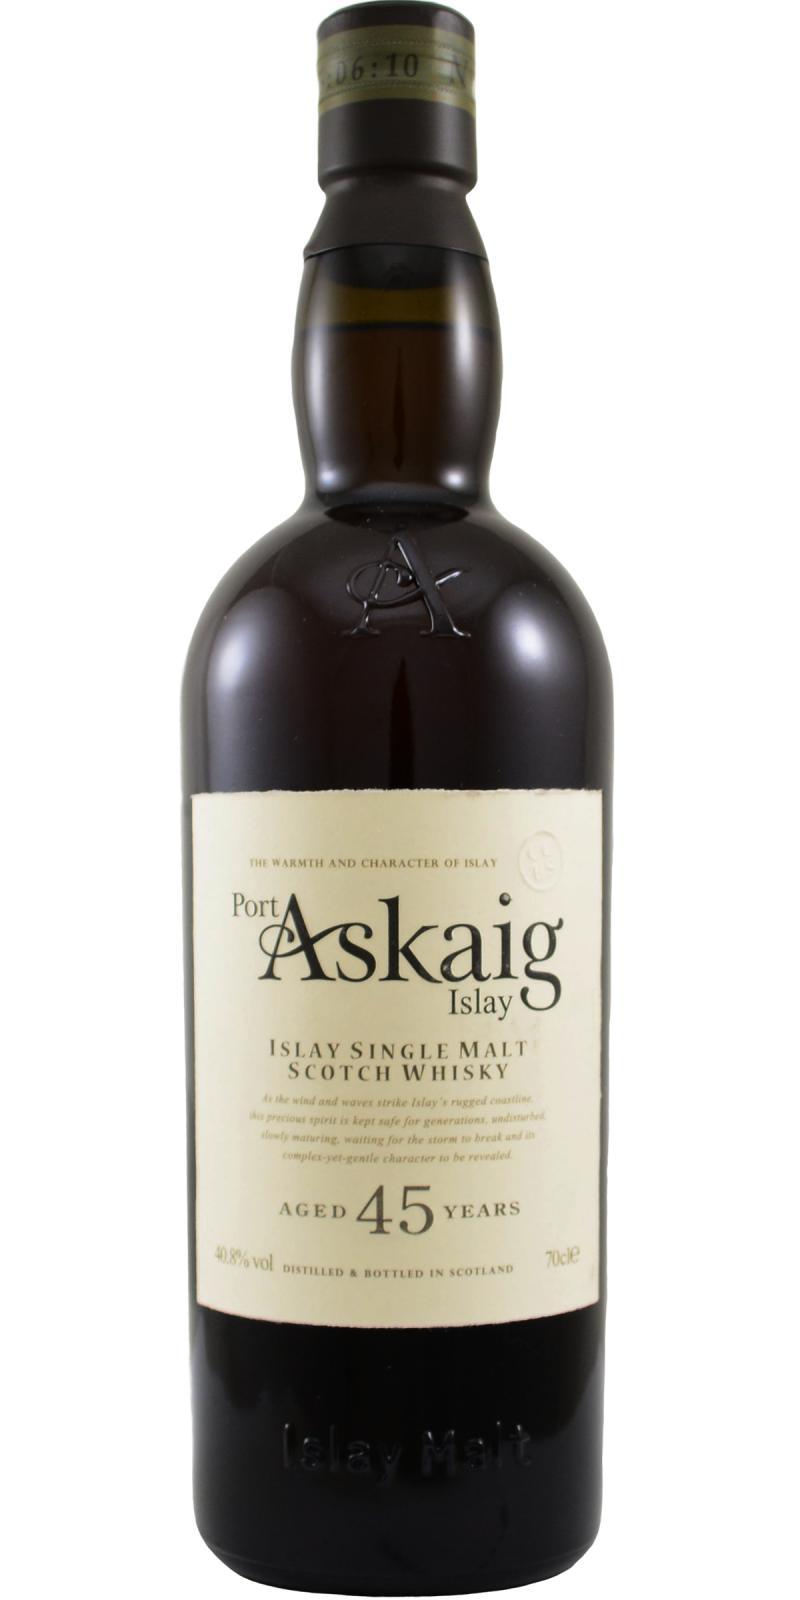 Port Askaig 45-year-old SMS